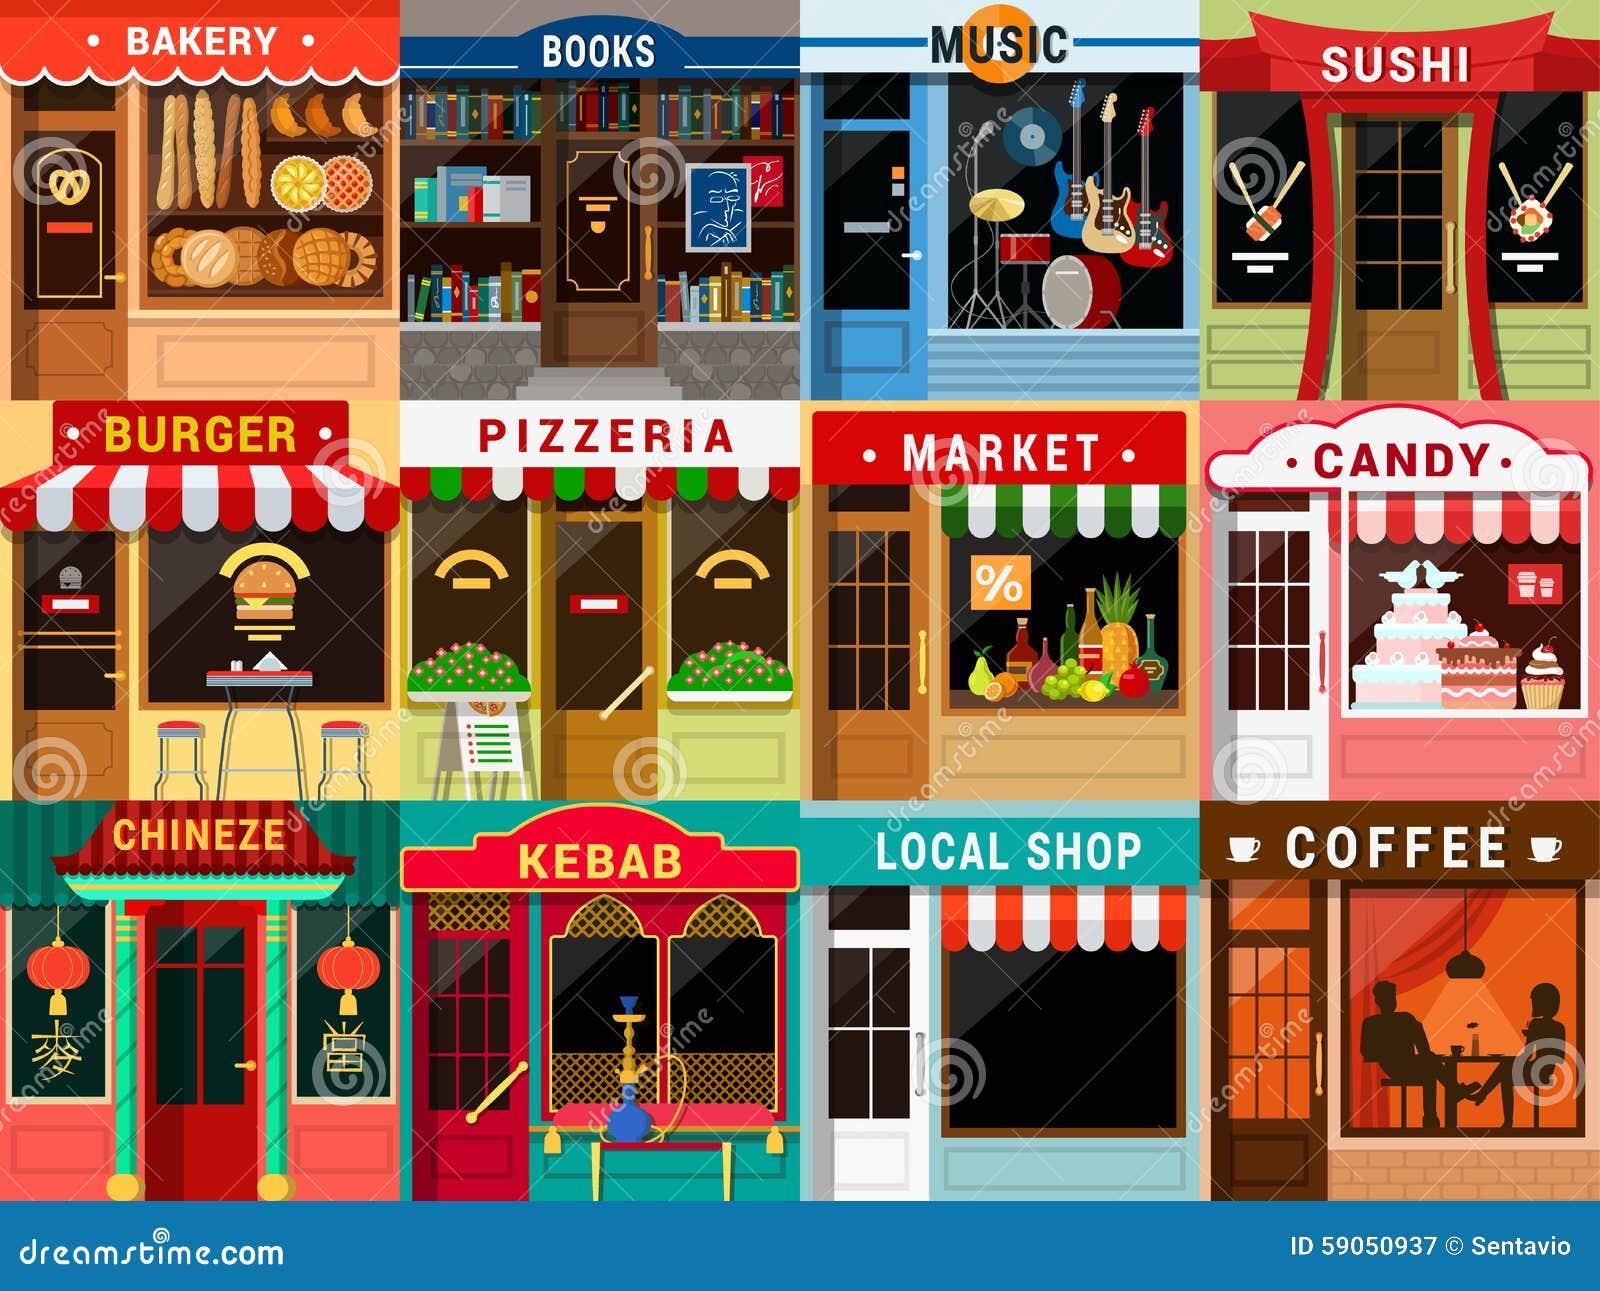 Flat Restaurant Cafe Shop Exterior: Kebab Coffee Bakery